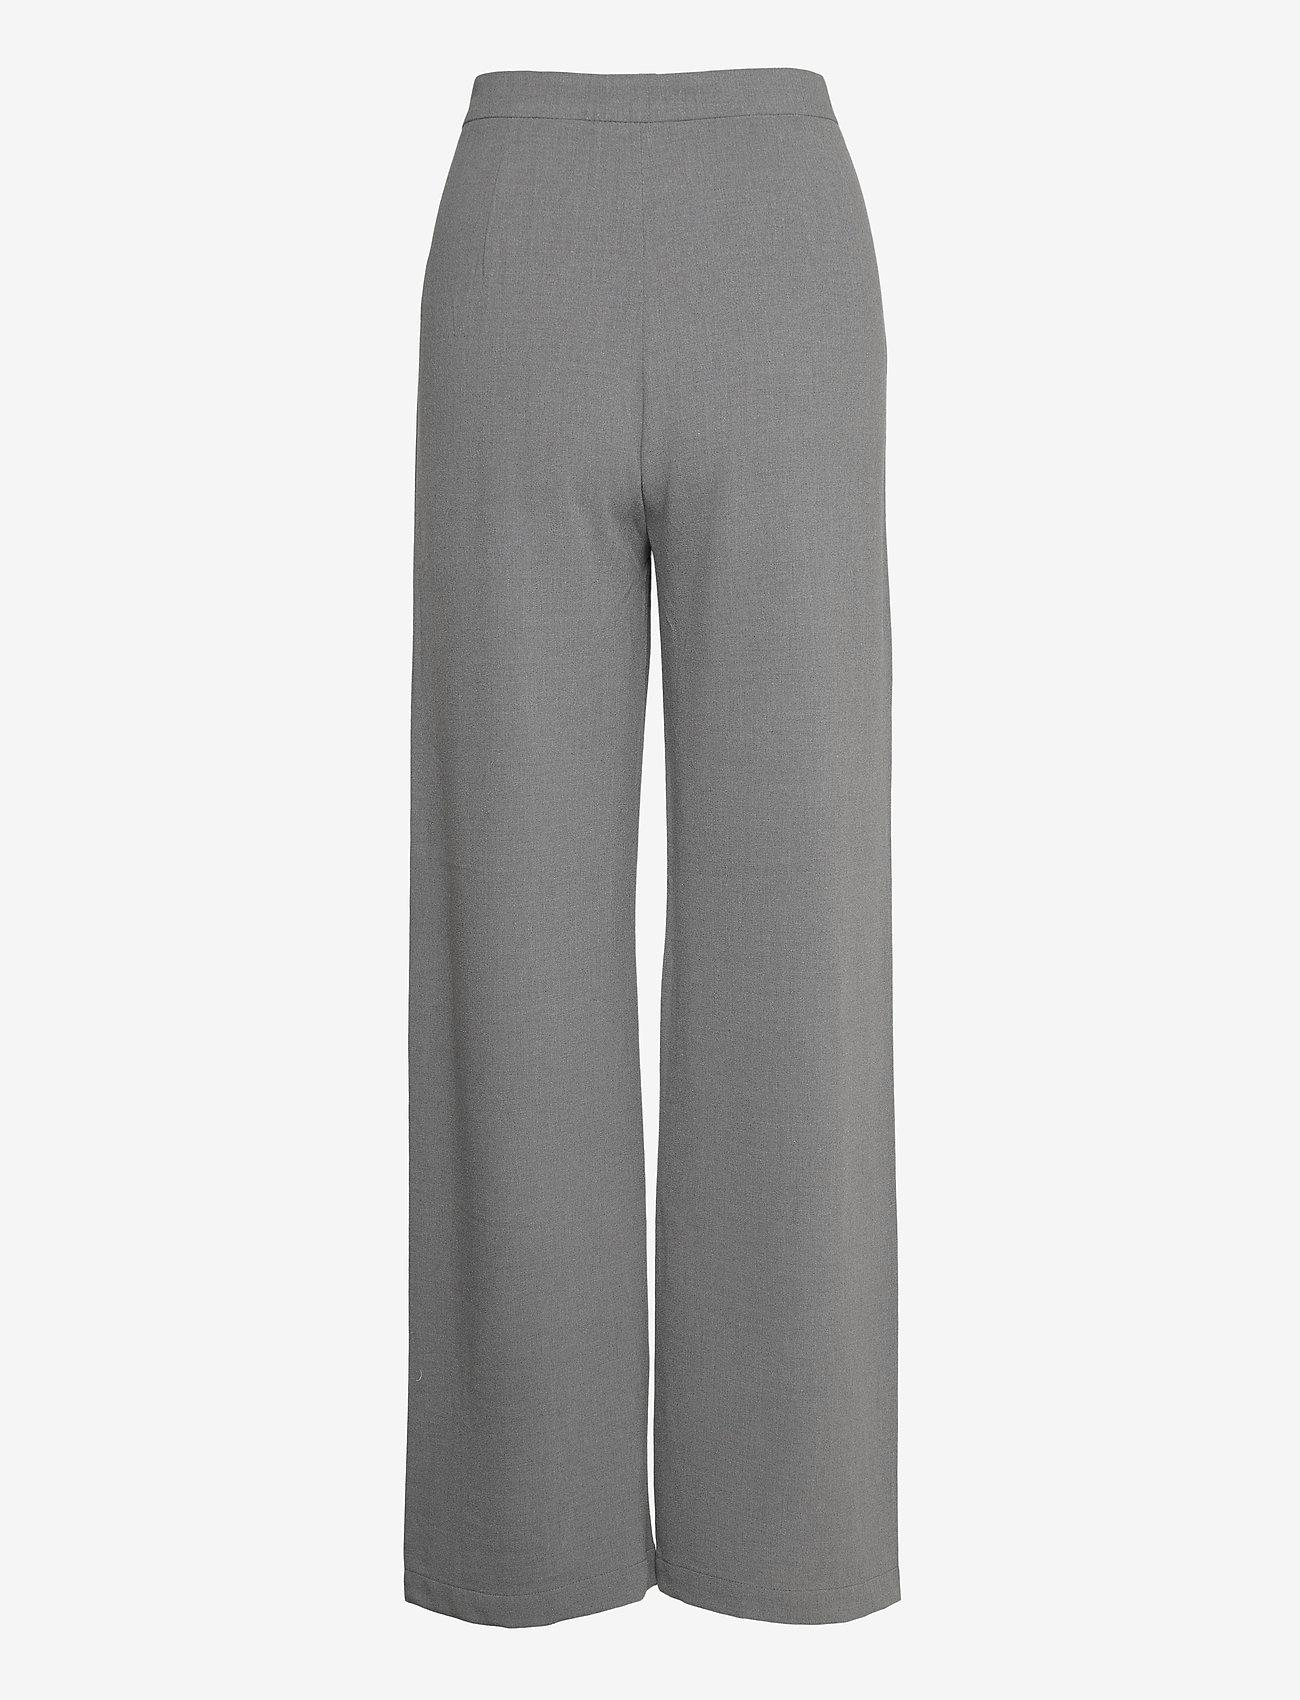 RODEBJER - SINI - bukser med brede ben - grey - 1